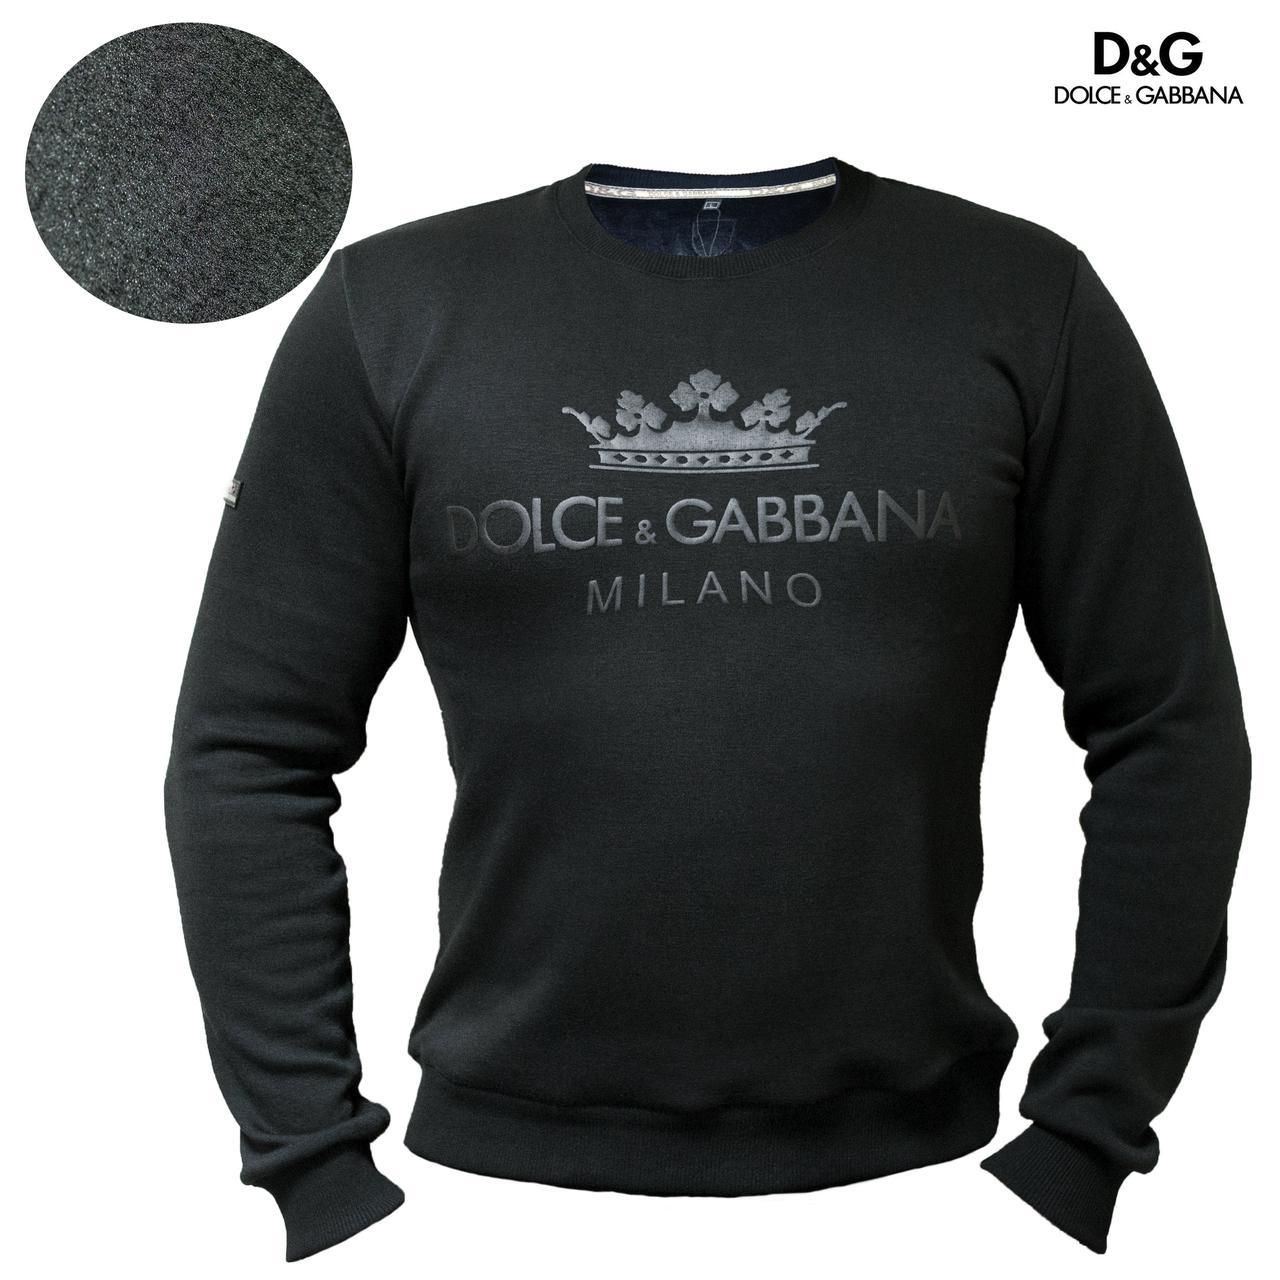 Батник DOLCE & GABBANA. Реплика  Мужская одежда М-48